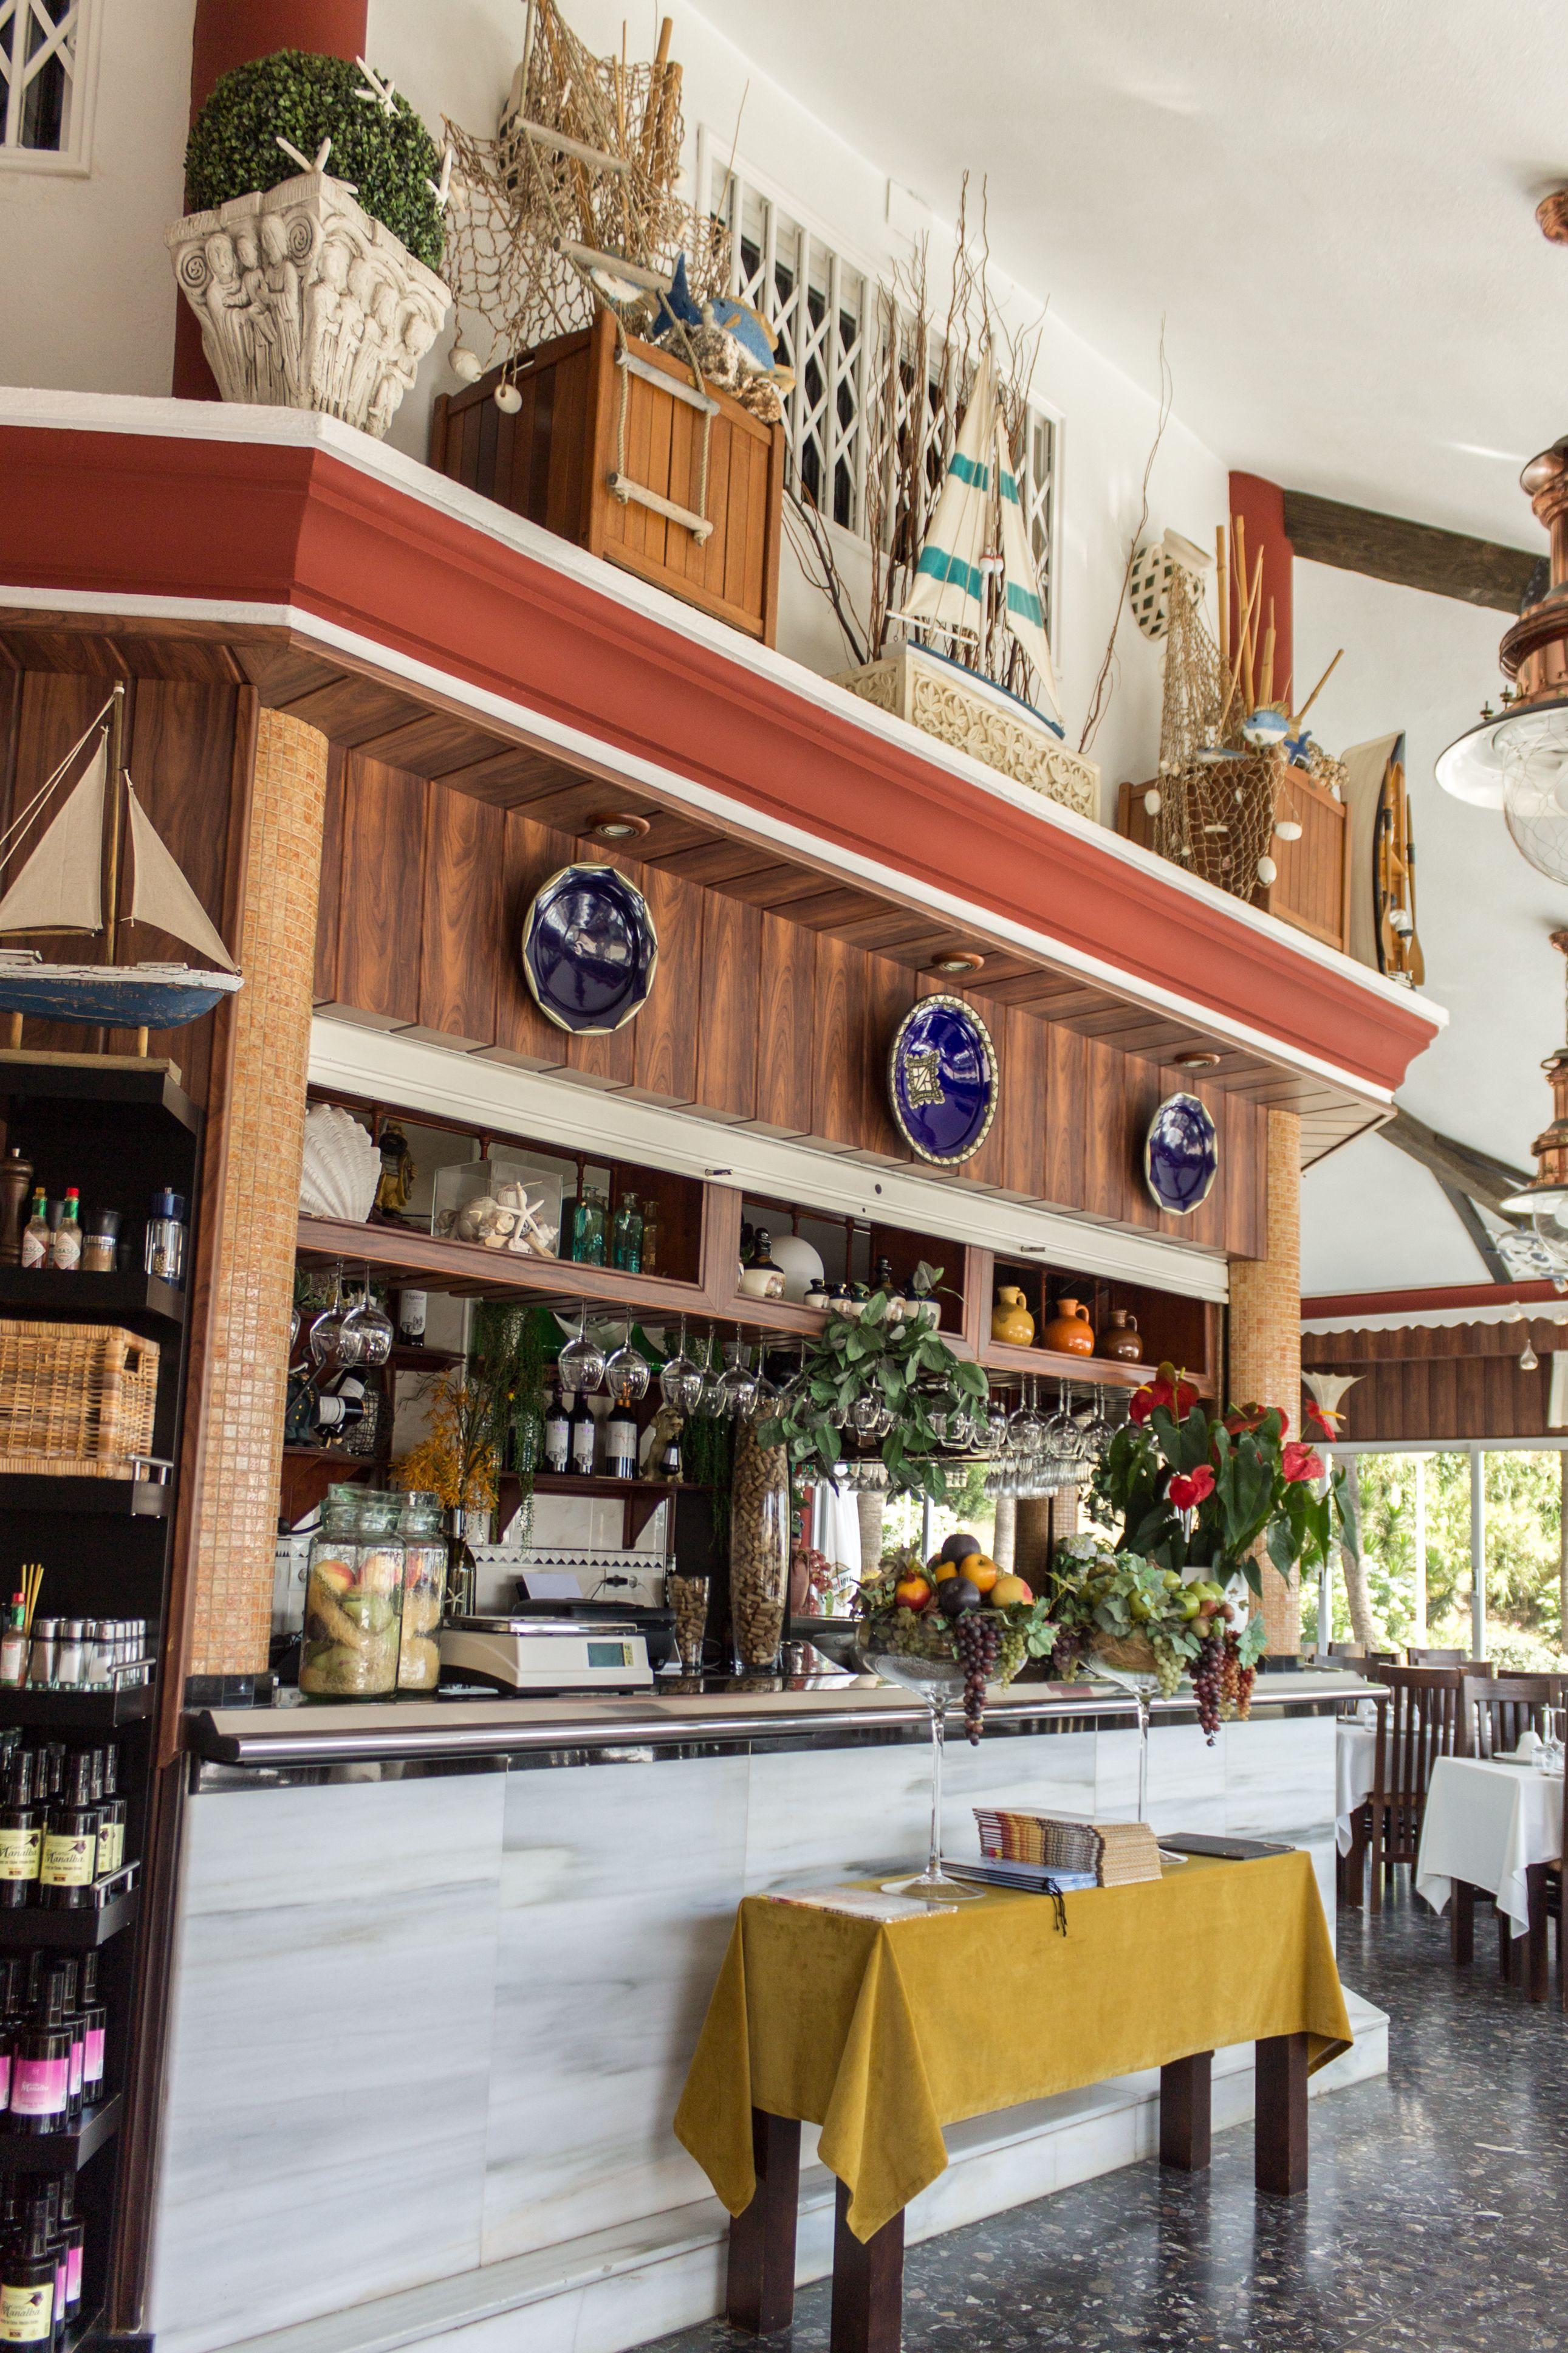 Restaurante arrocería en Málaga